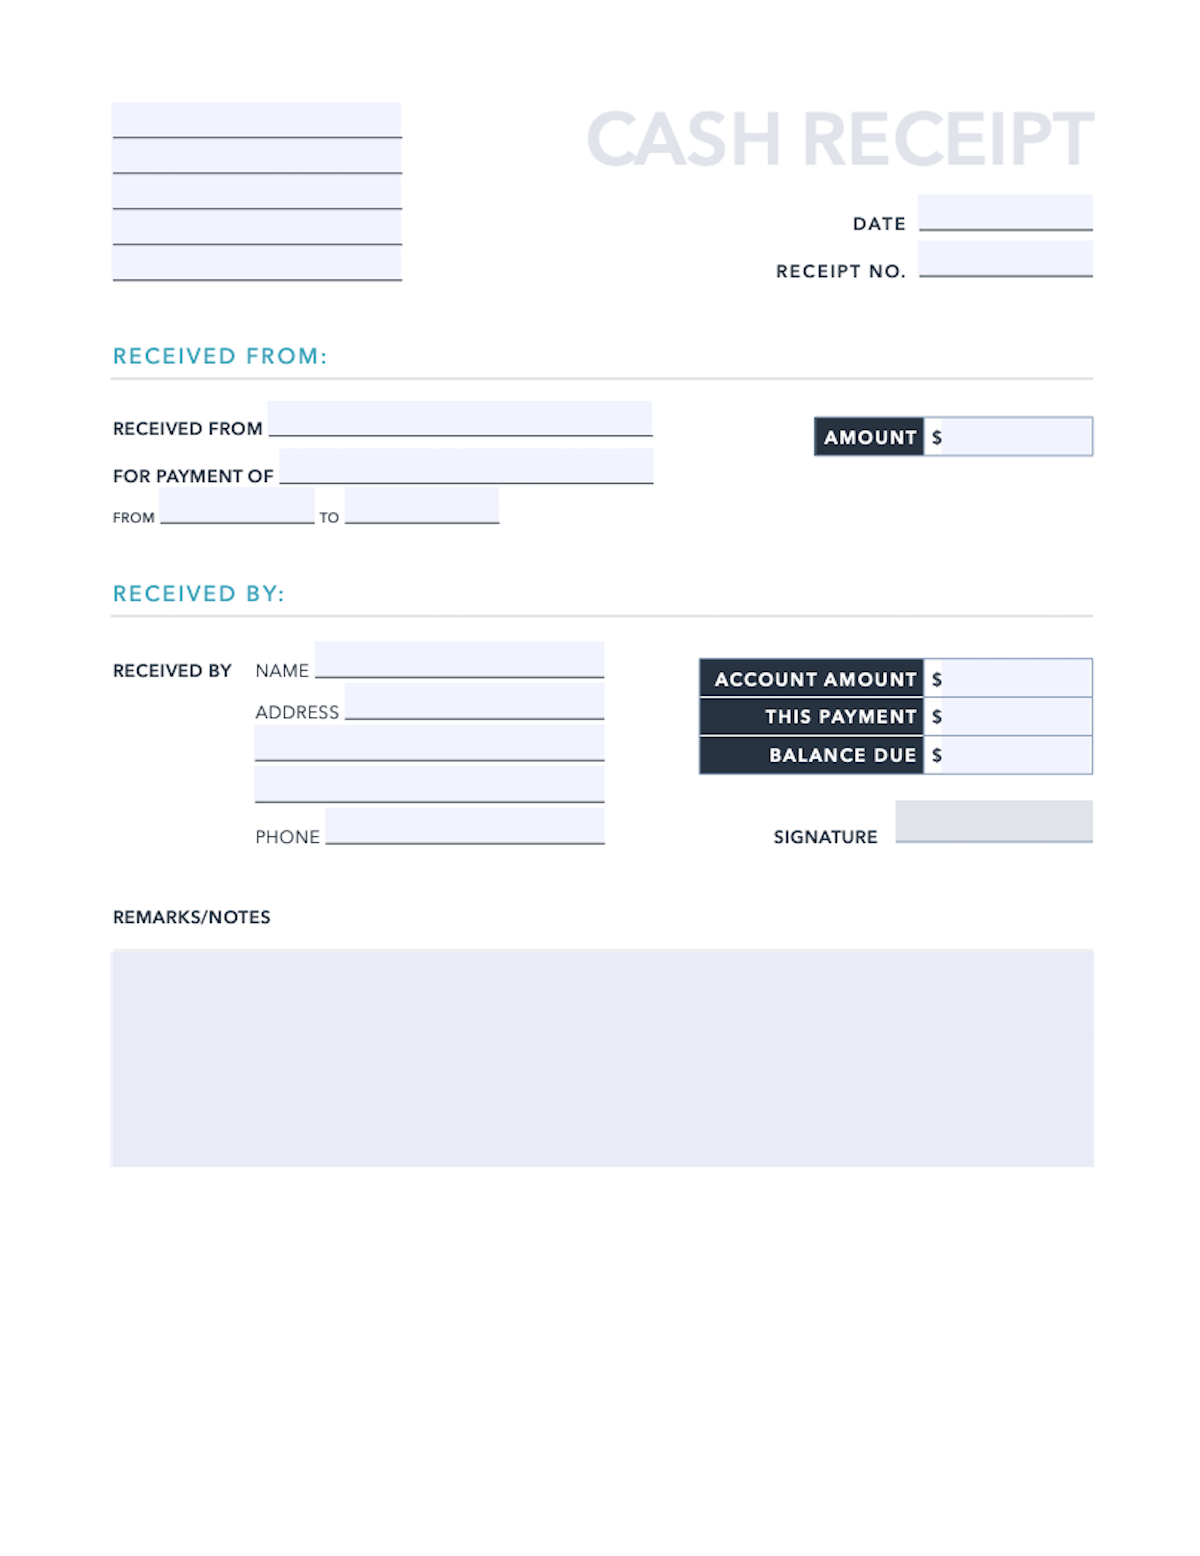 Free Cash Receipt Template For Pdf Excel Hubspot